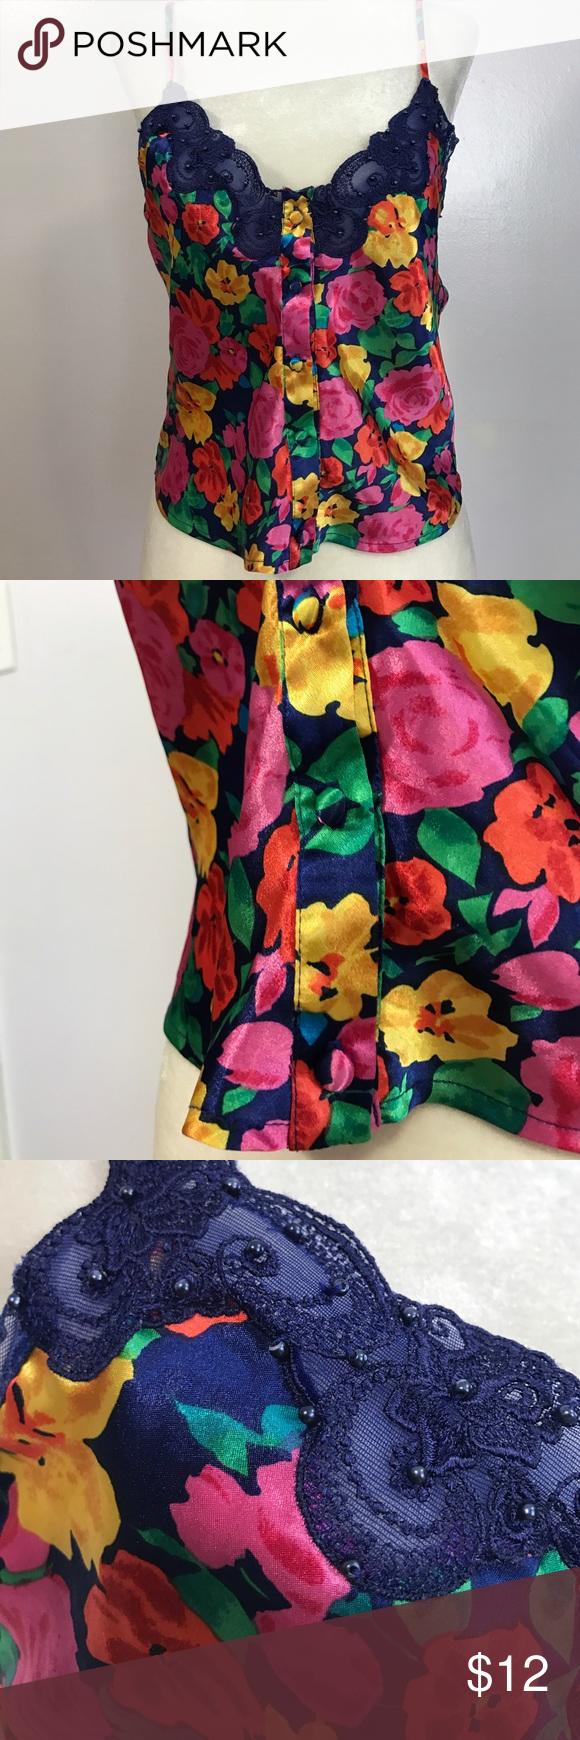 Victoria's Secret Vintage Cami- Sm Perfect condition- like new!💕💕 Victoria's Secret Intimates & Sleepwear